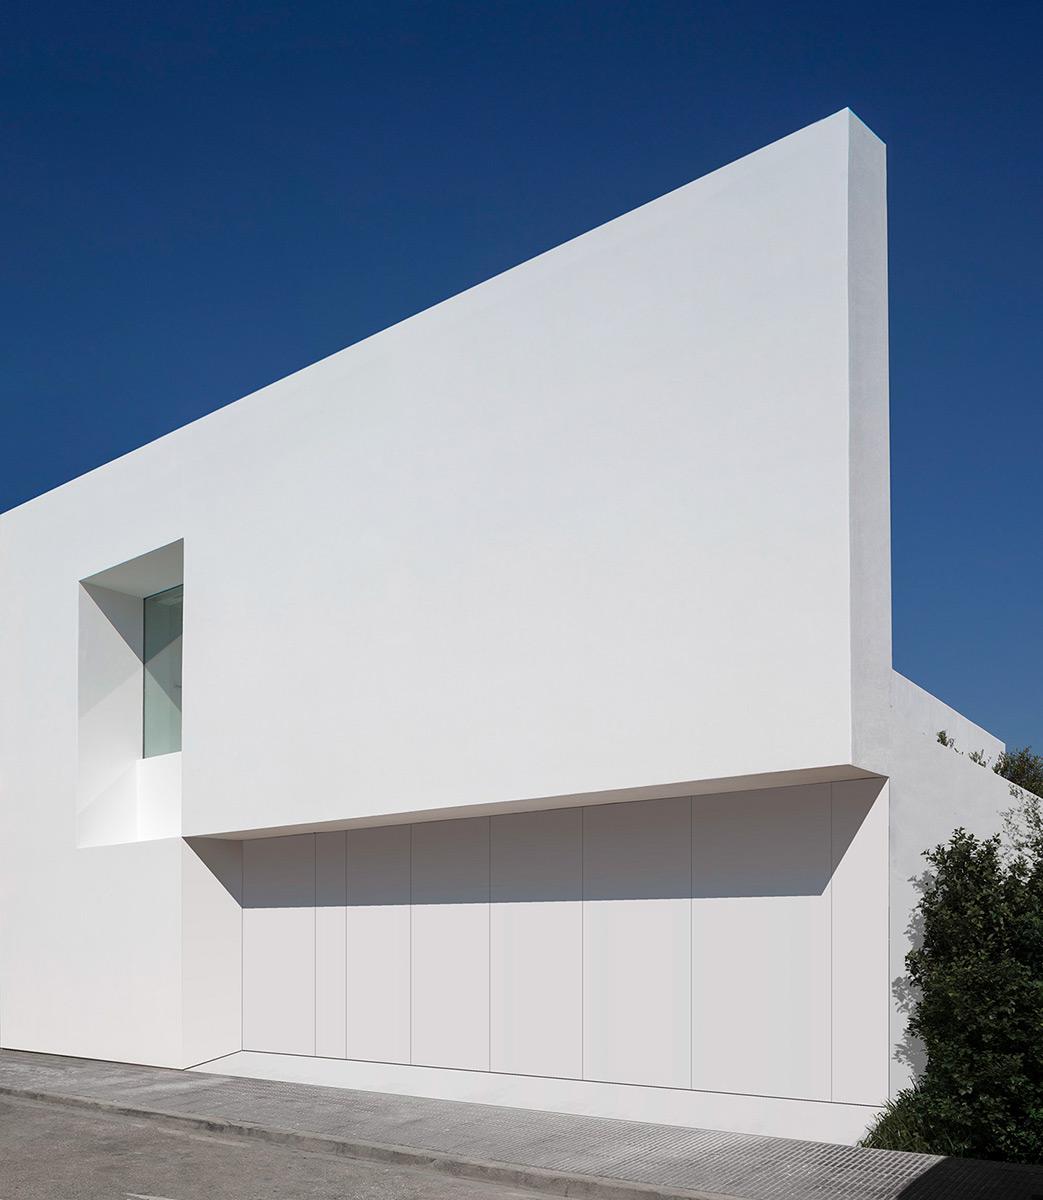 Casa-Pati-Blau-Fran-Silvestre-Arquitectos-Diego-Opazo-05